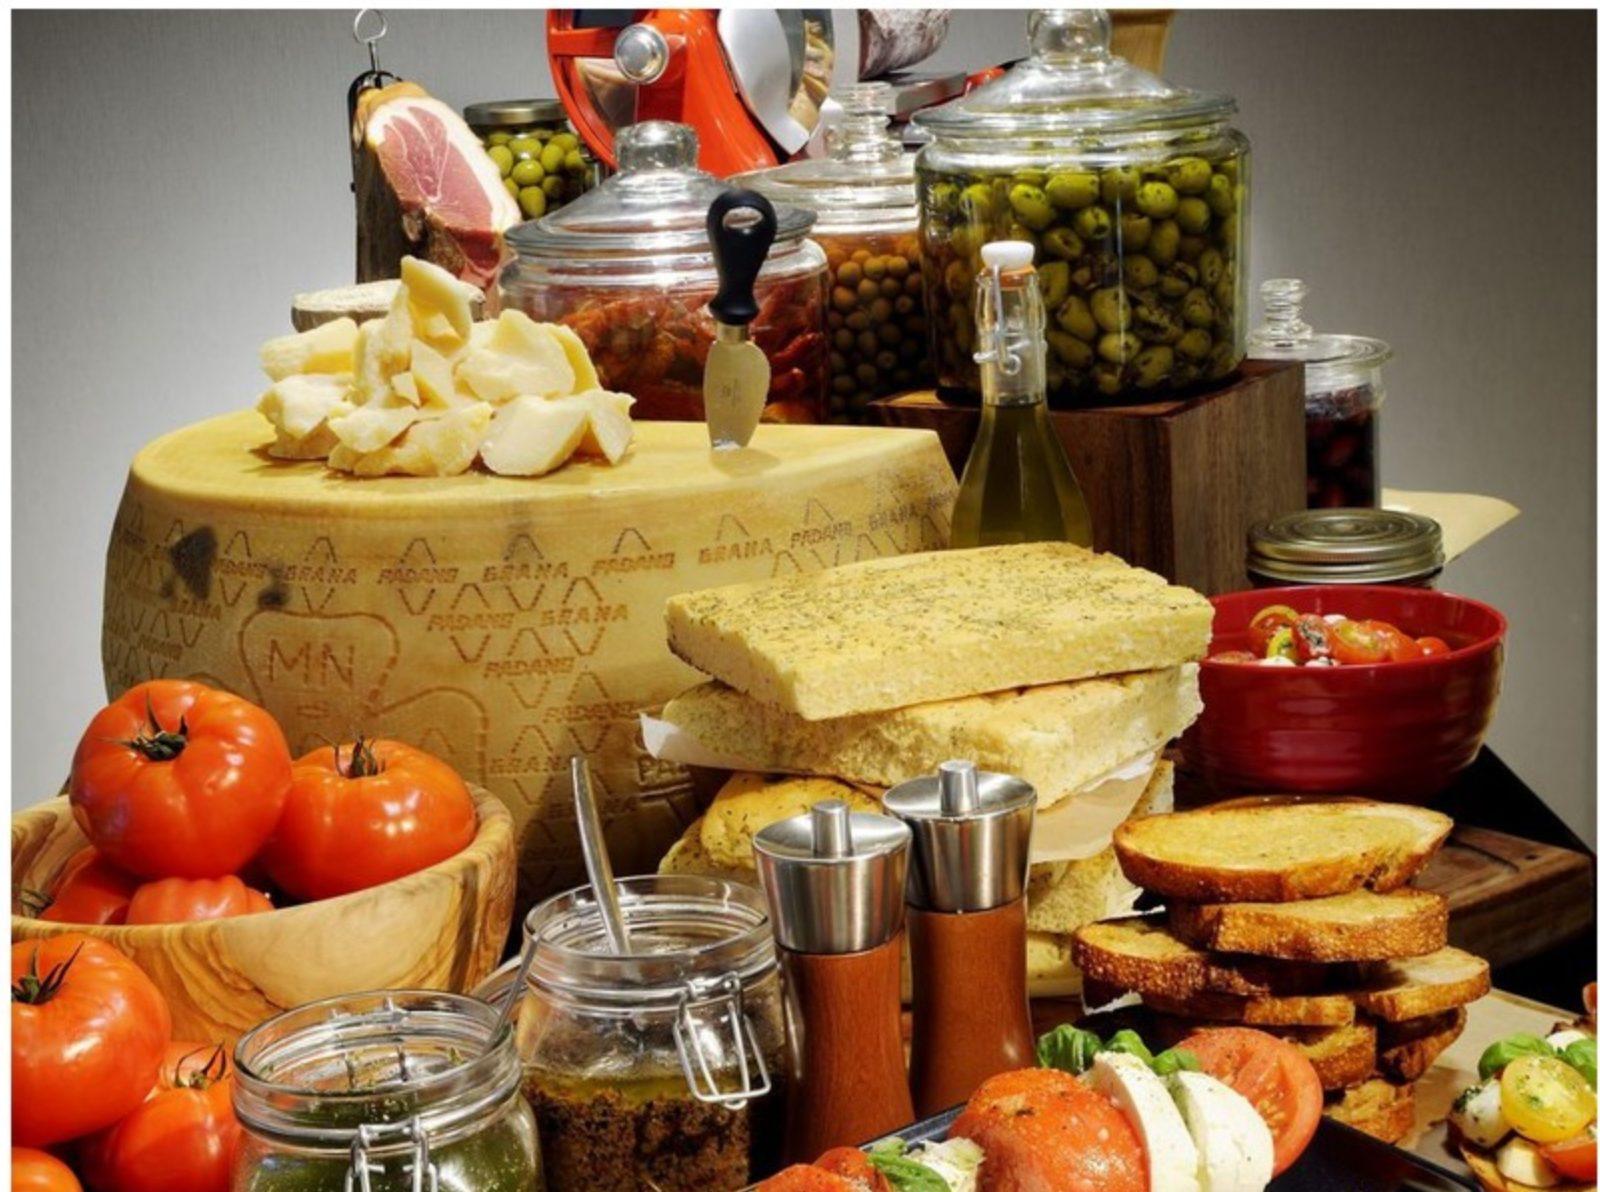 Gourmet Artisan Products